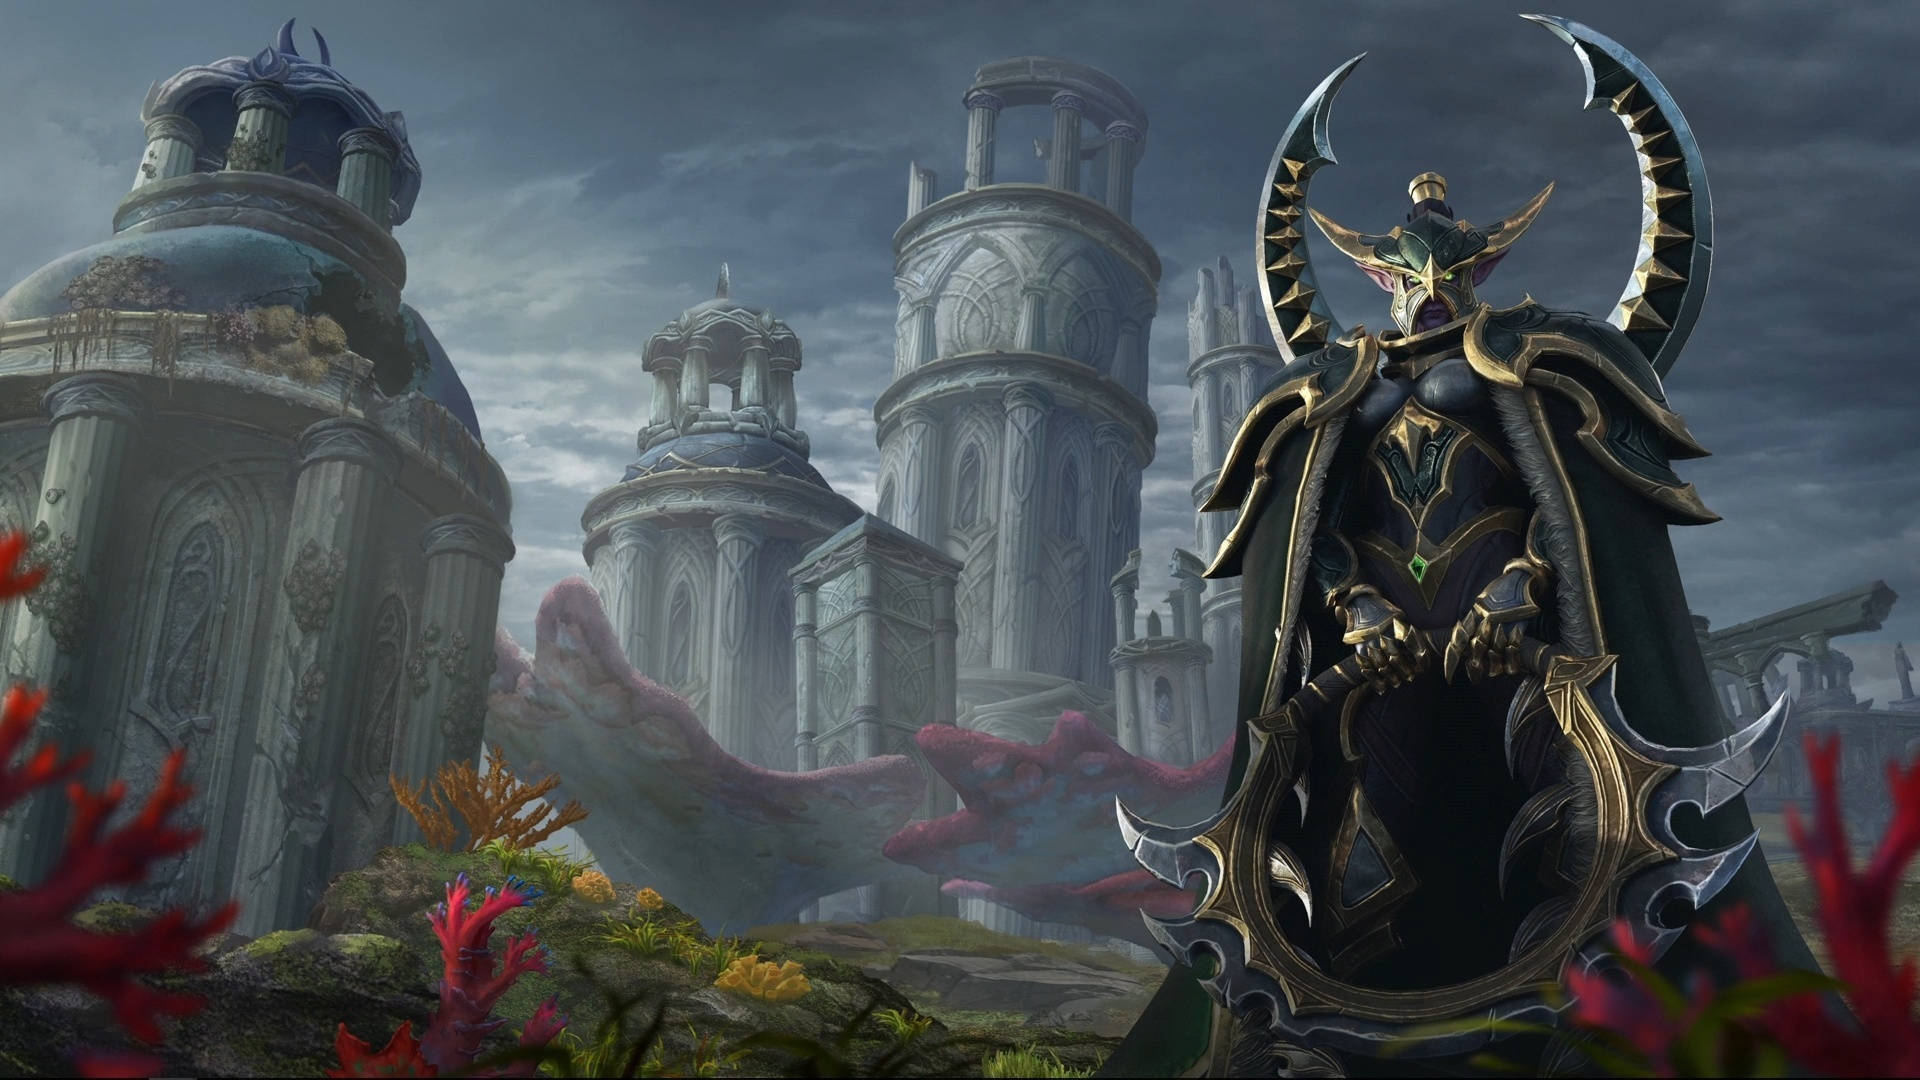 BlizzCon, Blizzard Entertainment, Warcraft 3: Reforged